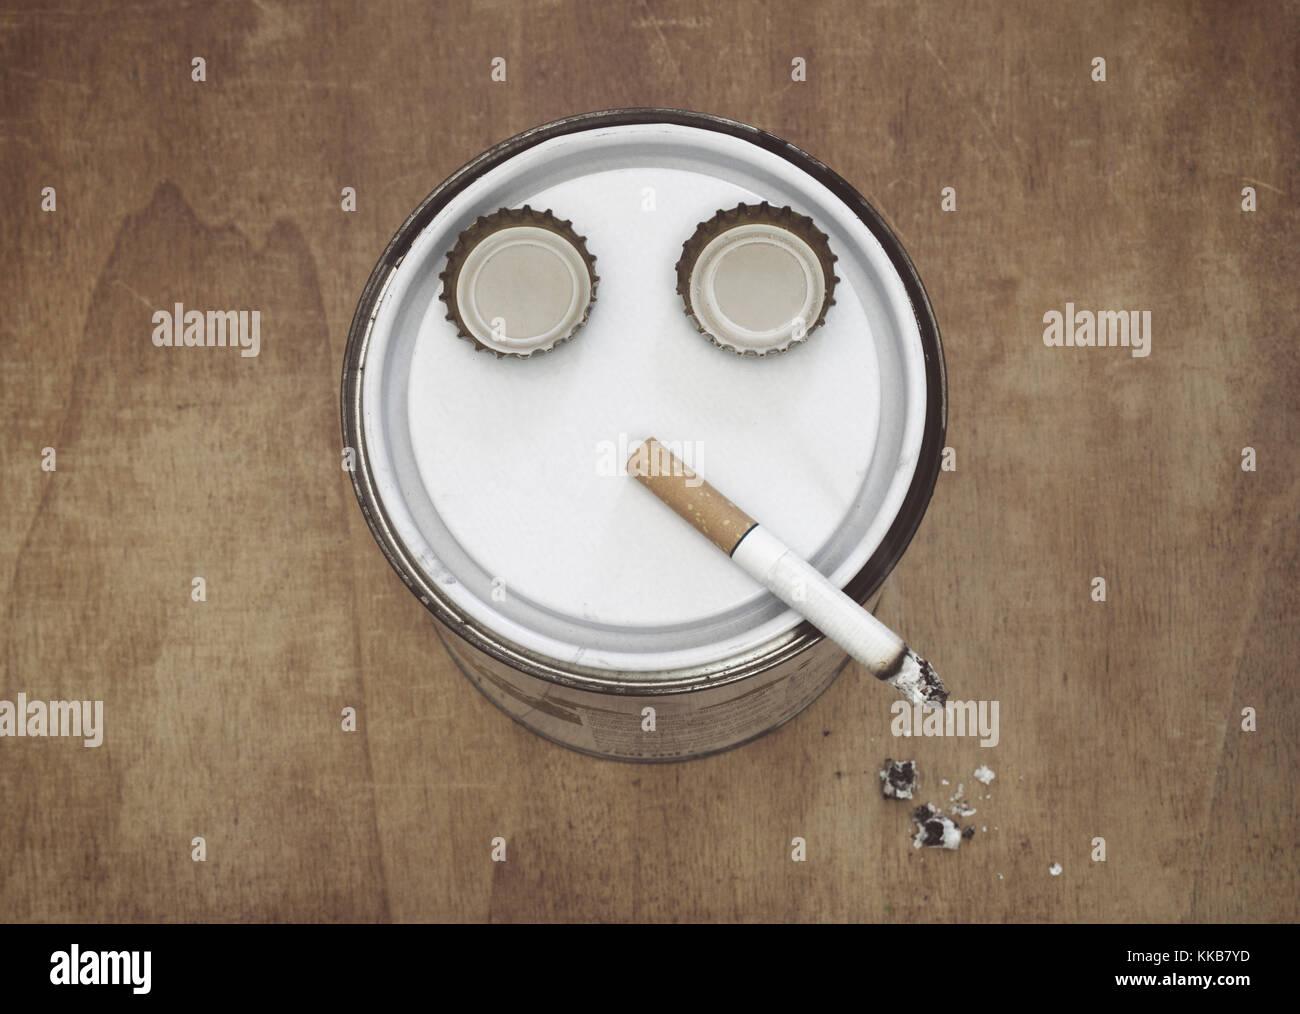 smoker imitation - Stock Image